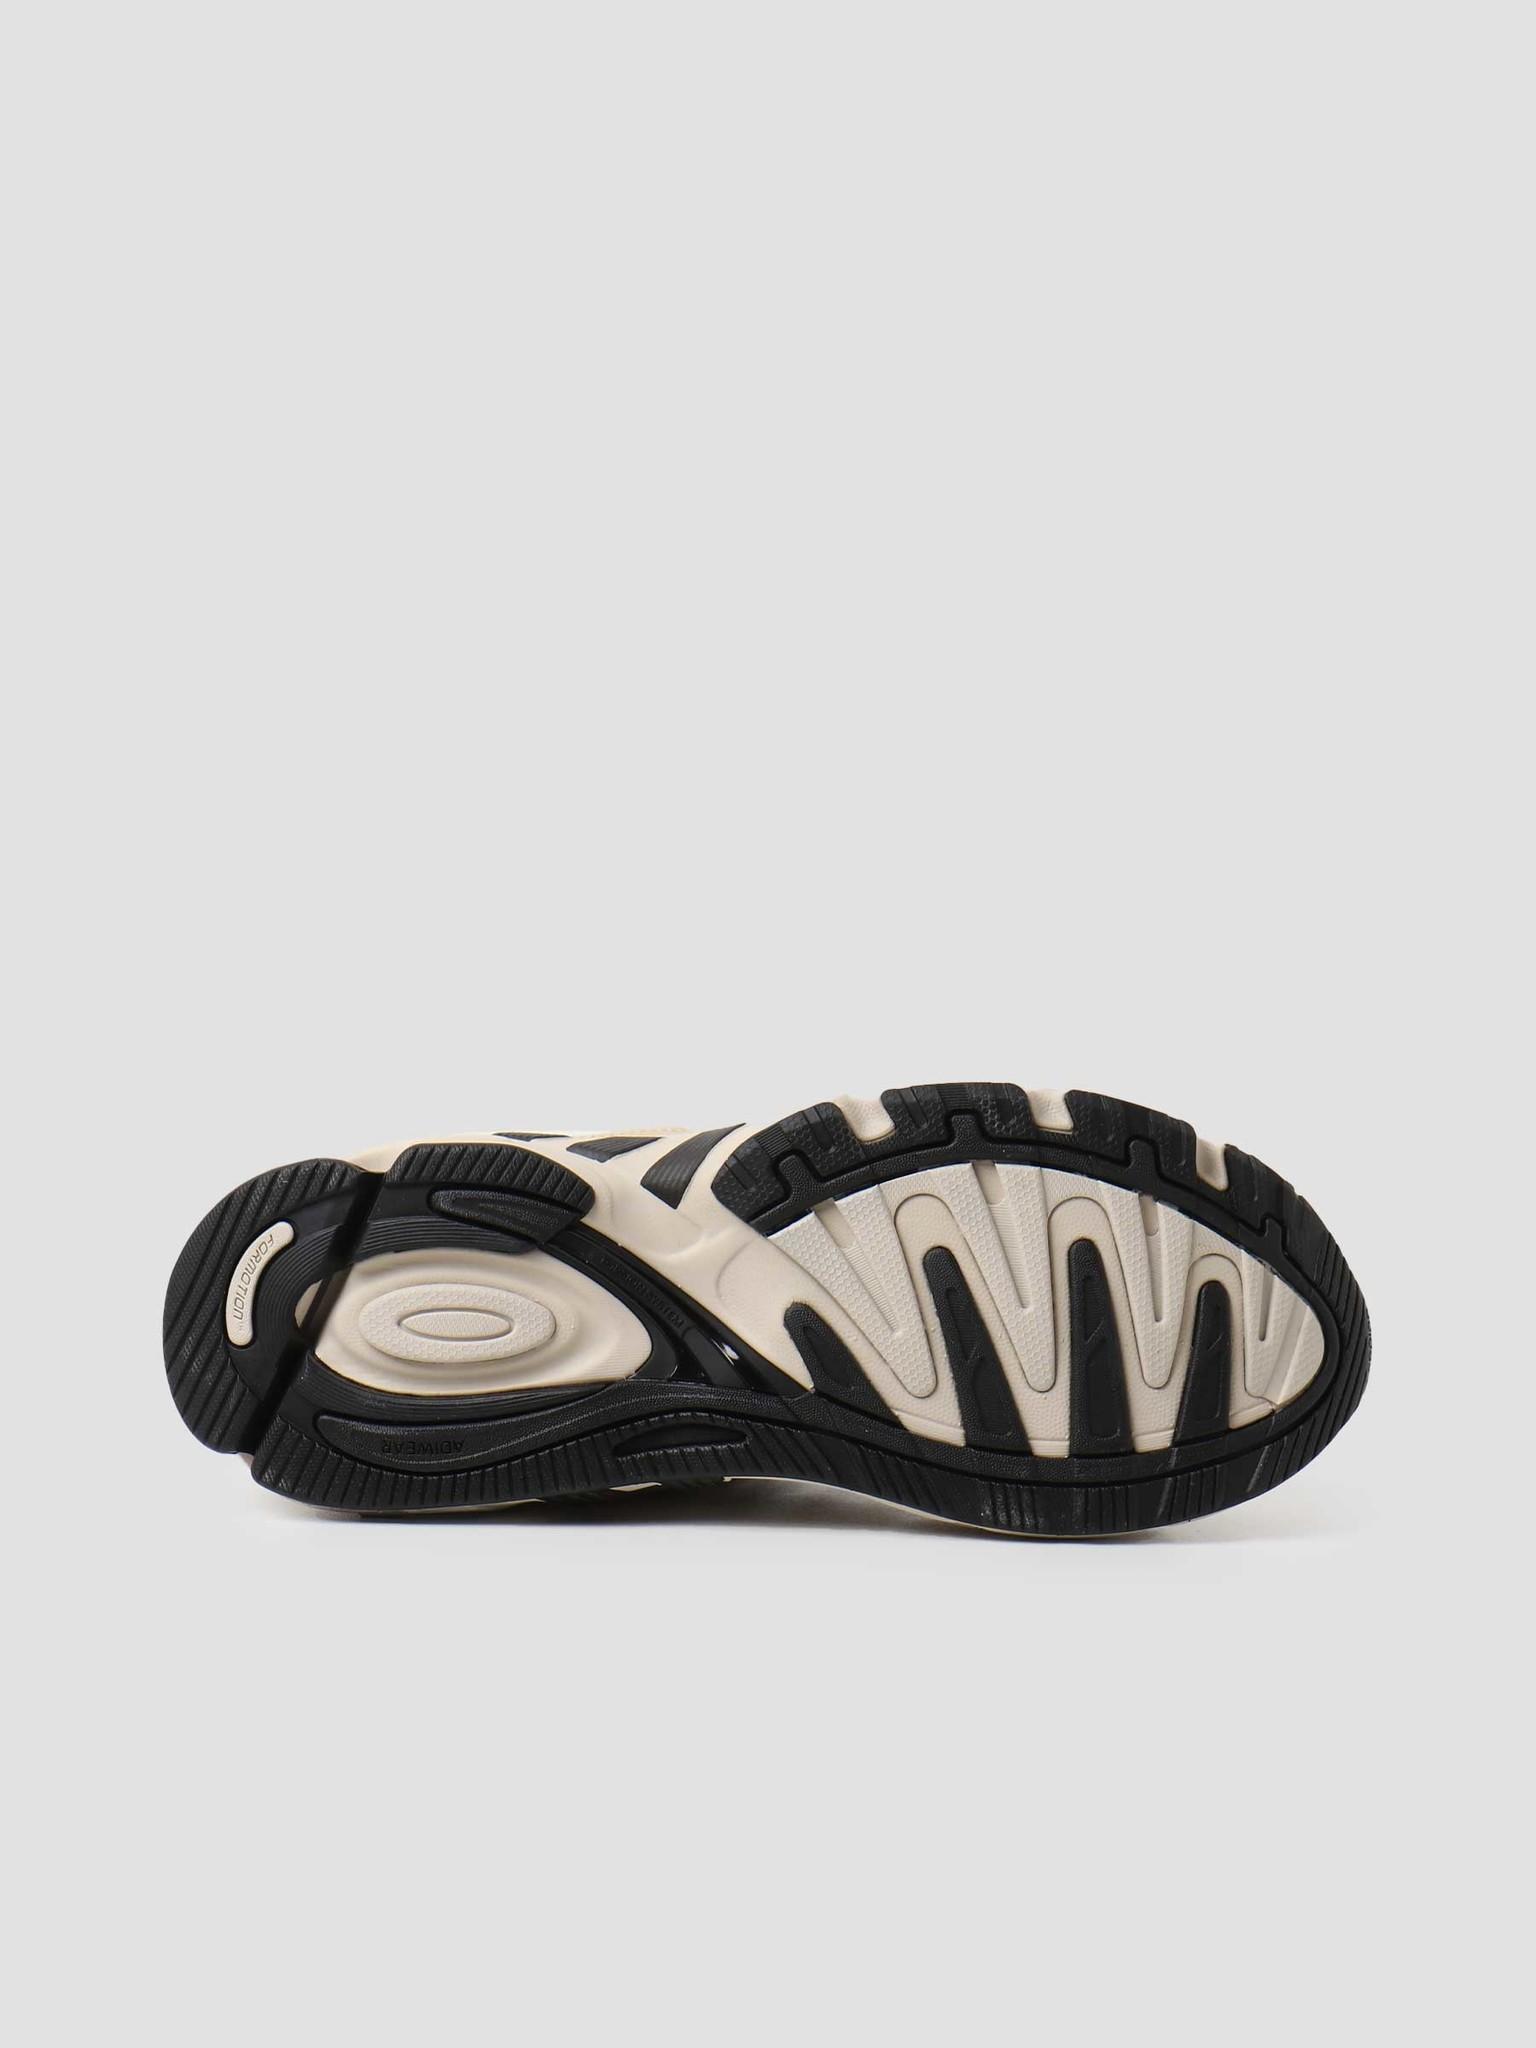 adidas adidas Response CL Brown Gold FX6167